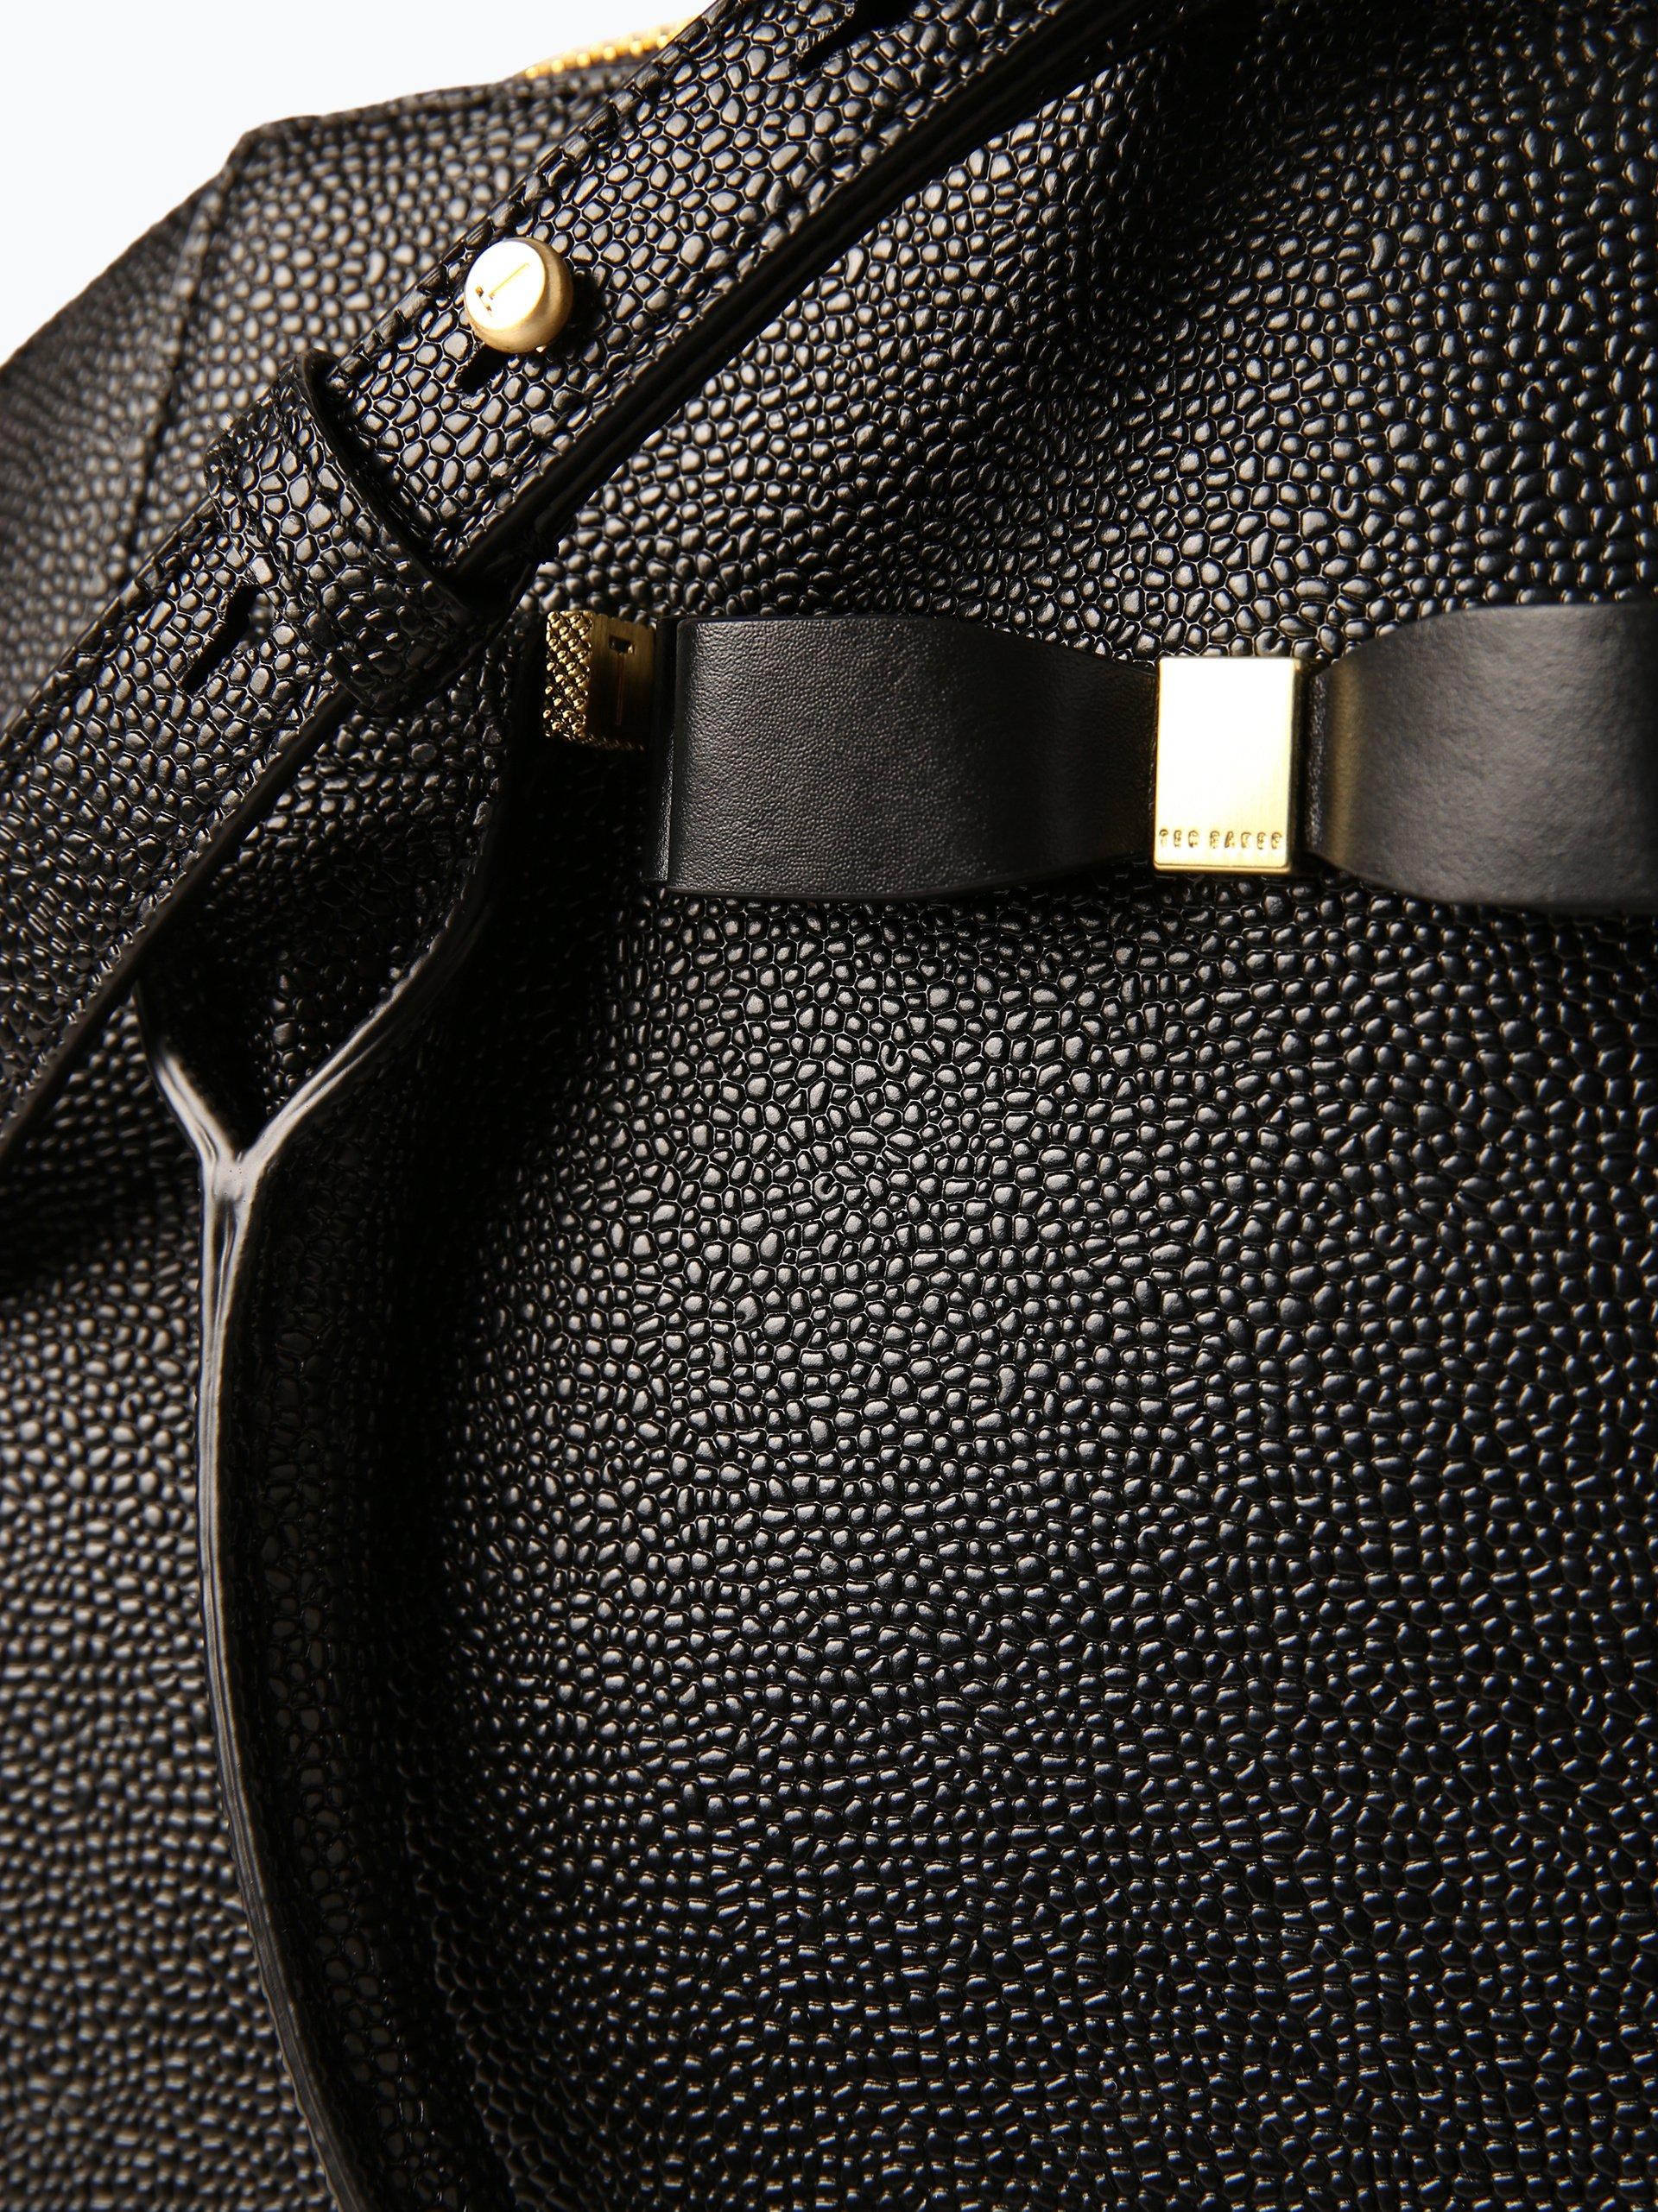 Ted Baker Damen Handtasche aus Leder - Janne